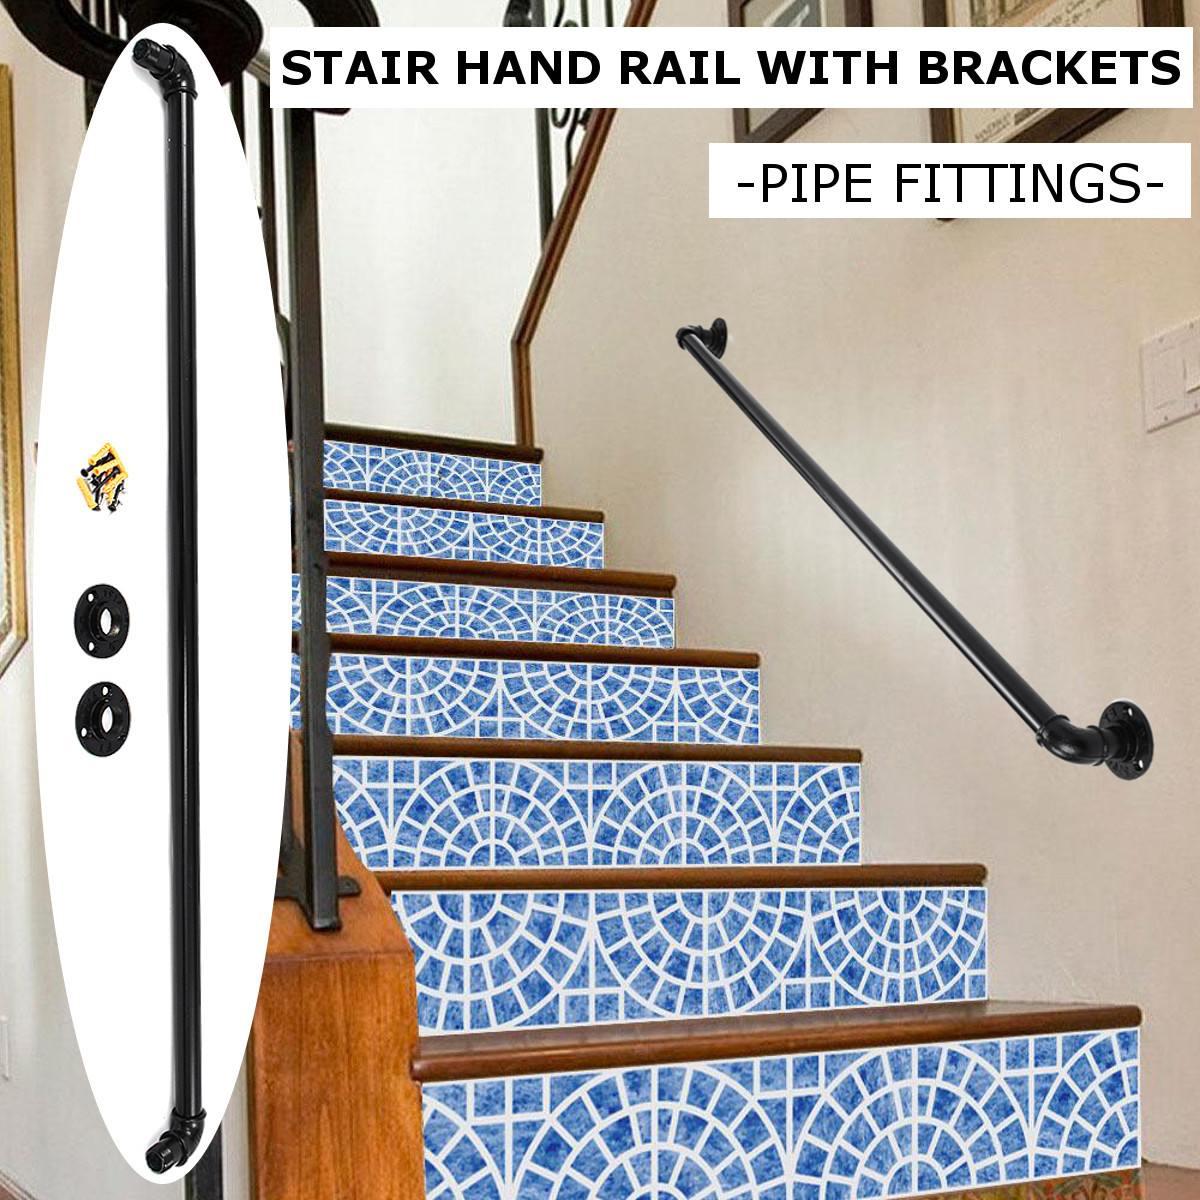 1M Industrial Retro Bookshelf Black Wall Ceiling Mounted Open Bookshelf Parts Bracket Iron Pipe Shelf Stair Bathroom Handrail